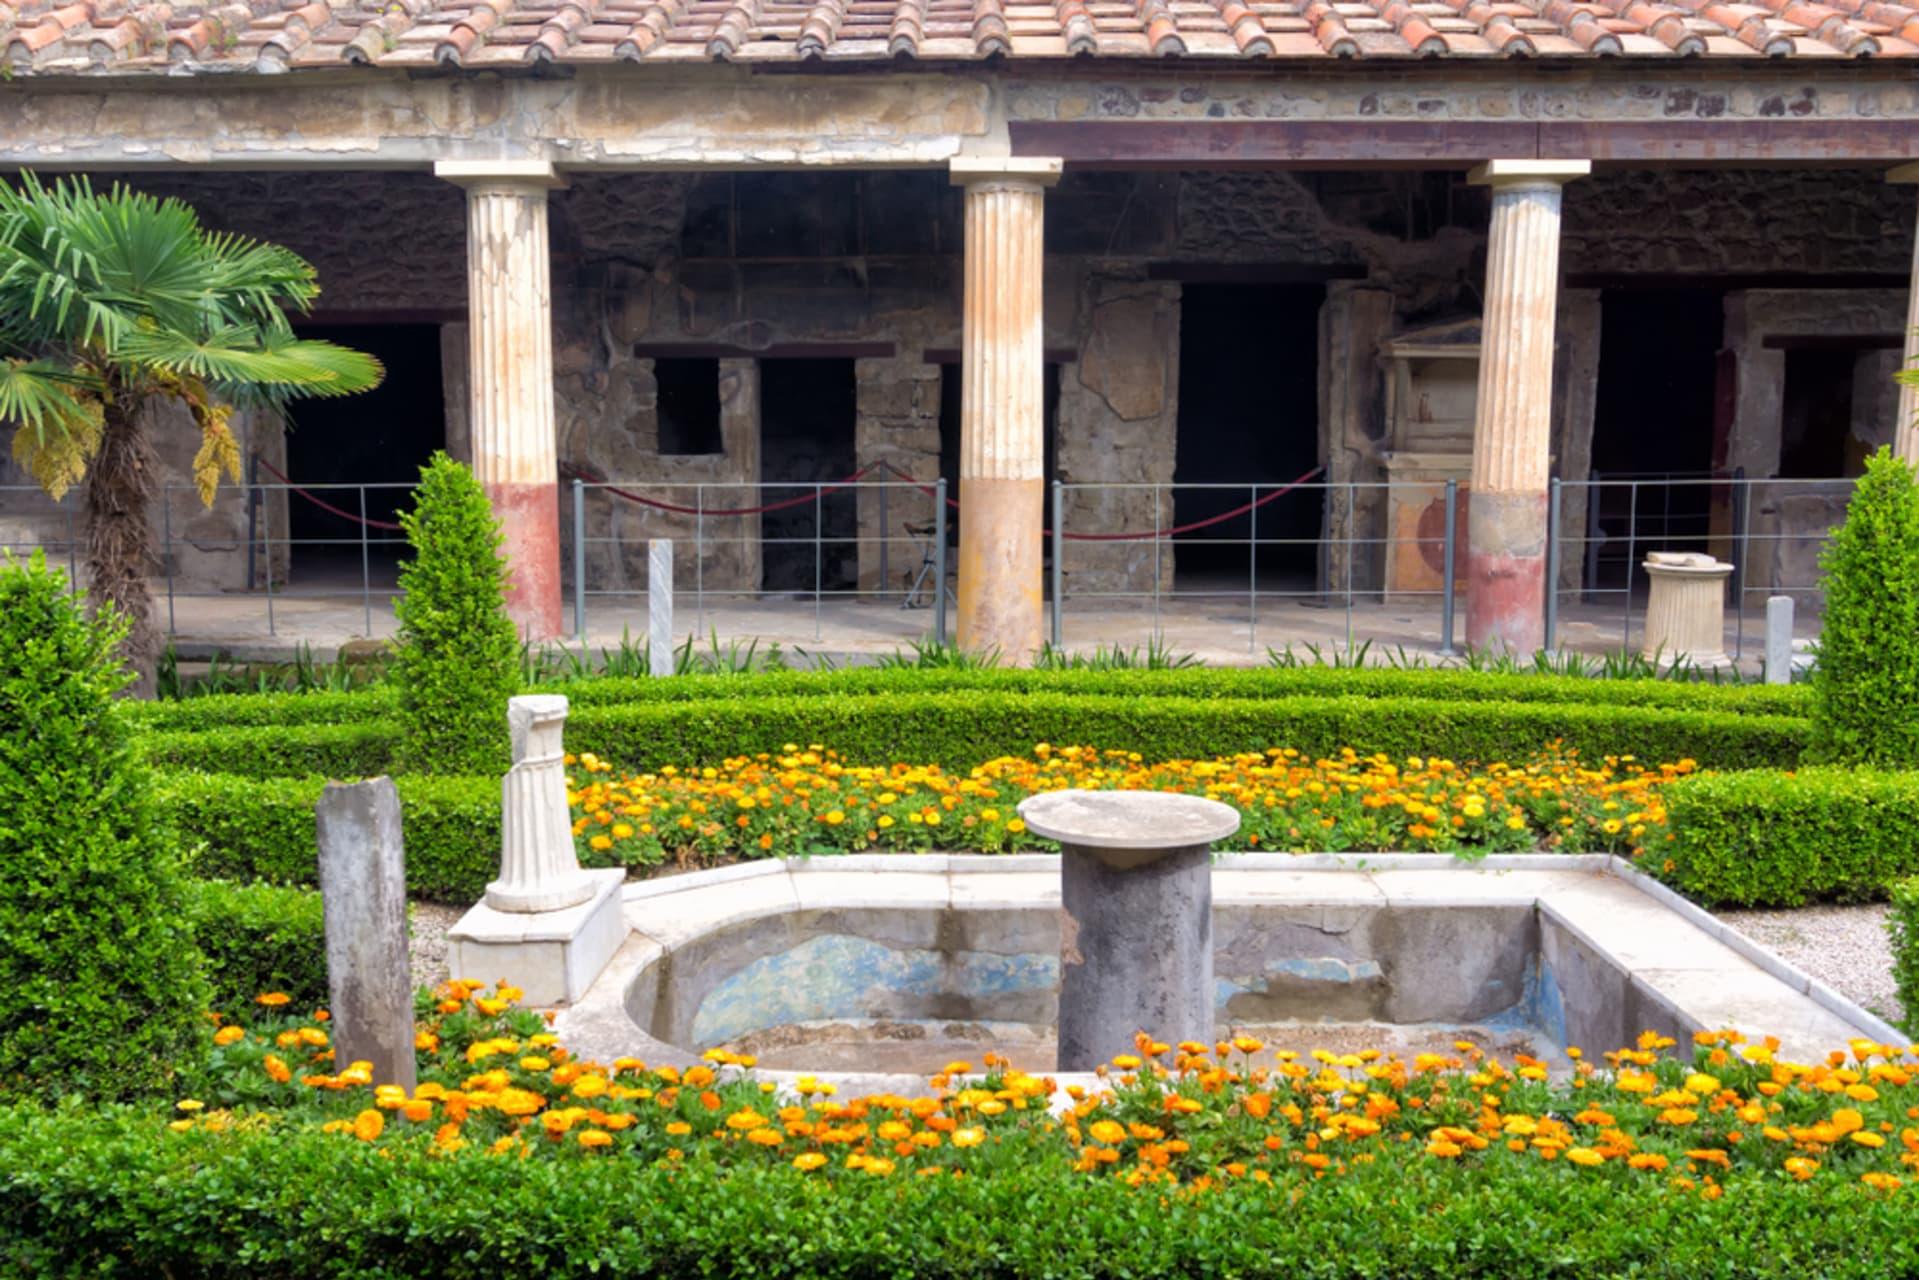 Pompeii and  Herculaneum - Pompeii Part 2: the Gladiator Amphitheatre and Luxurious Mosaics